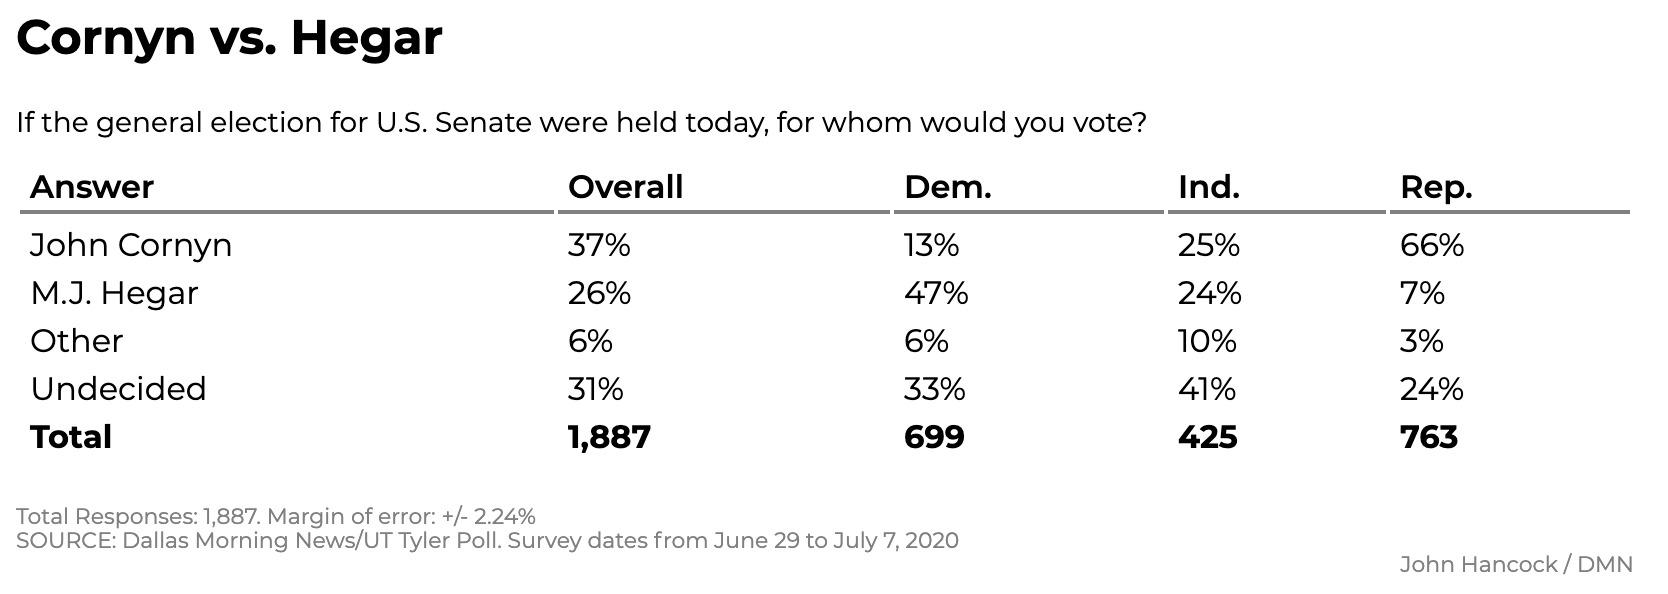 Screen-Shot-2020-07-12-at-12.07.03-PM New Texas Poll Results Show Surprising 5-Point Biden Surge Coronavirus Featured Politics Polls Top Stories